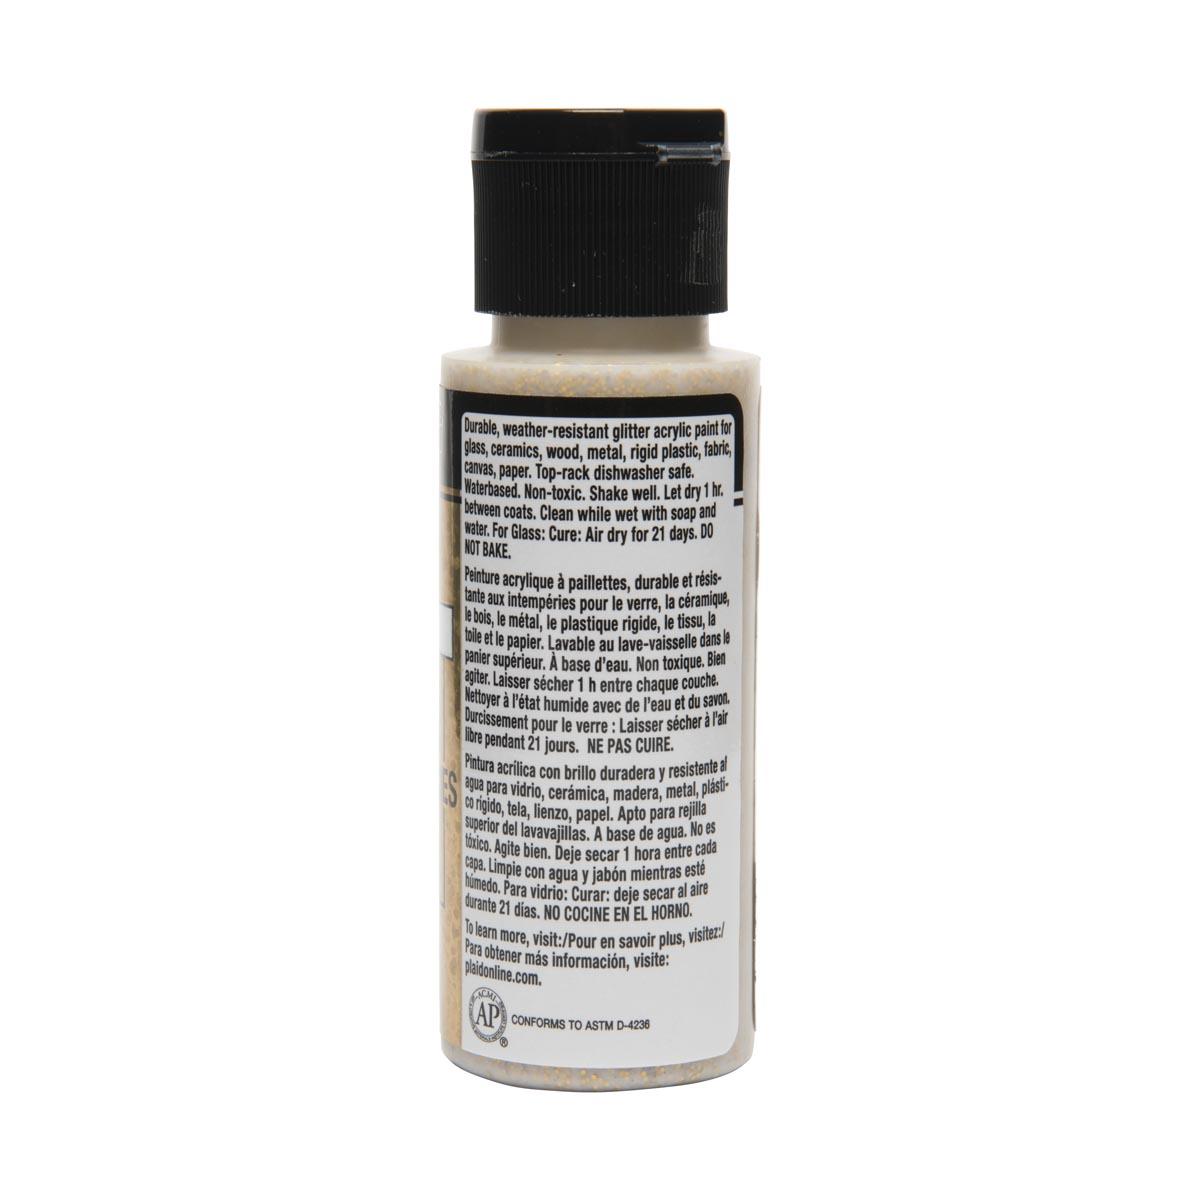 FolkArt ® Multi-Surface Glitter Acrylic Paints - Chunky Gold, 2 oz.